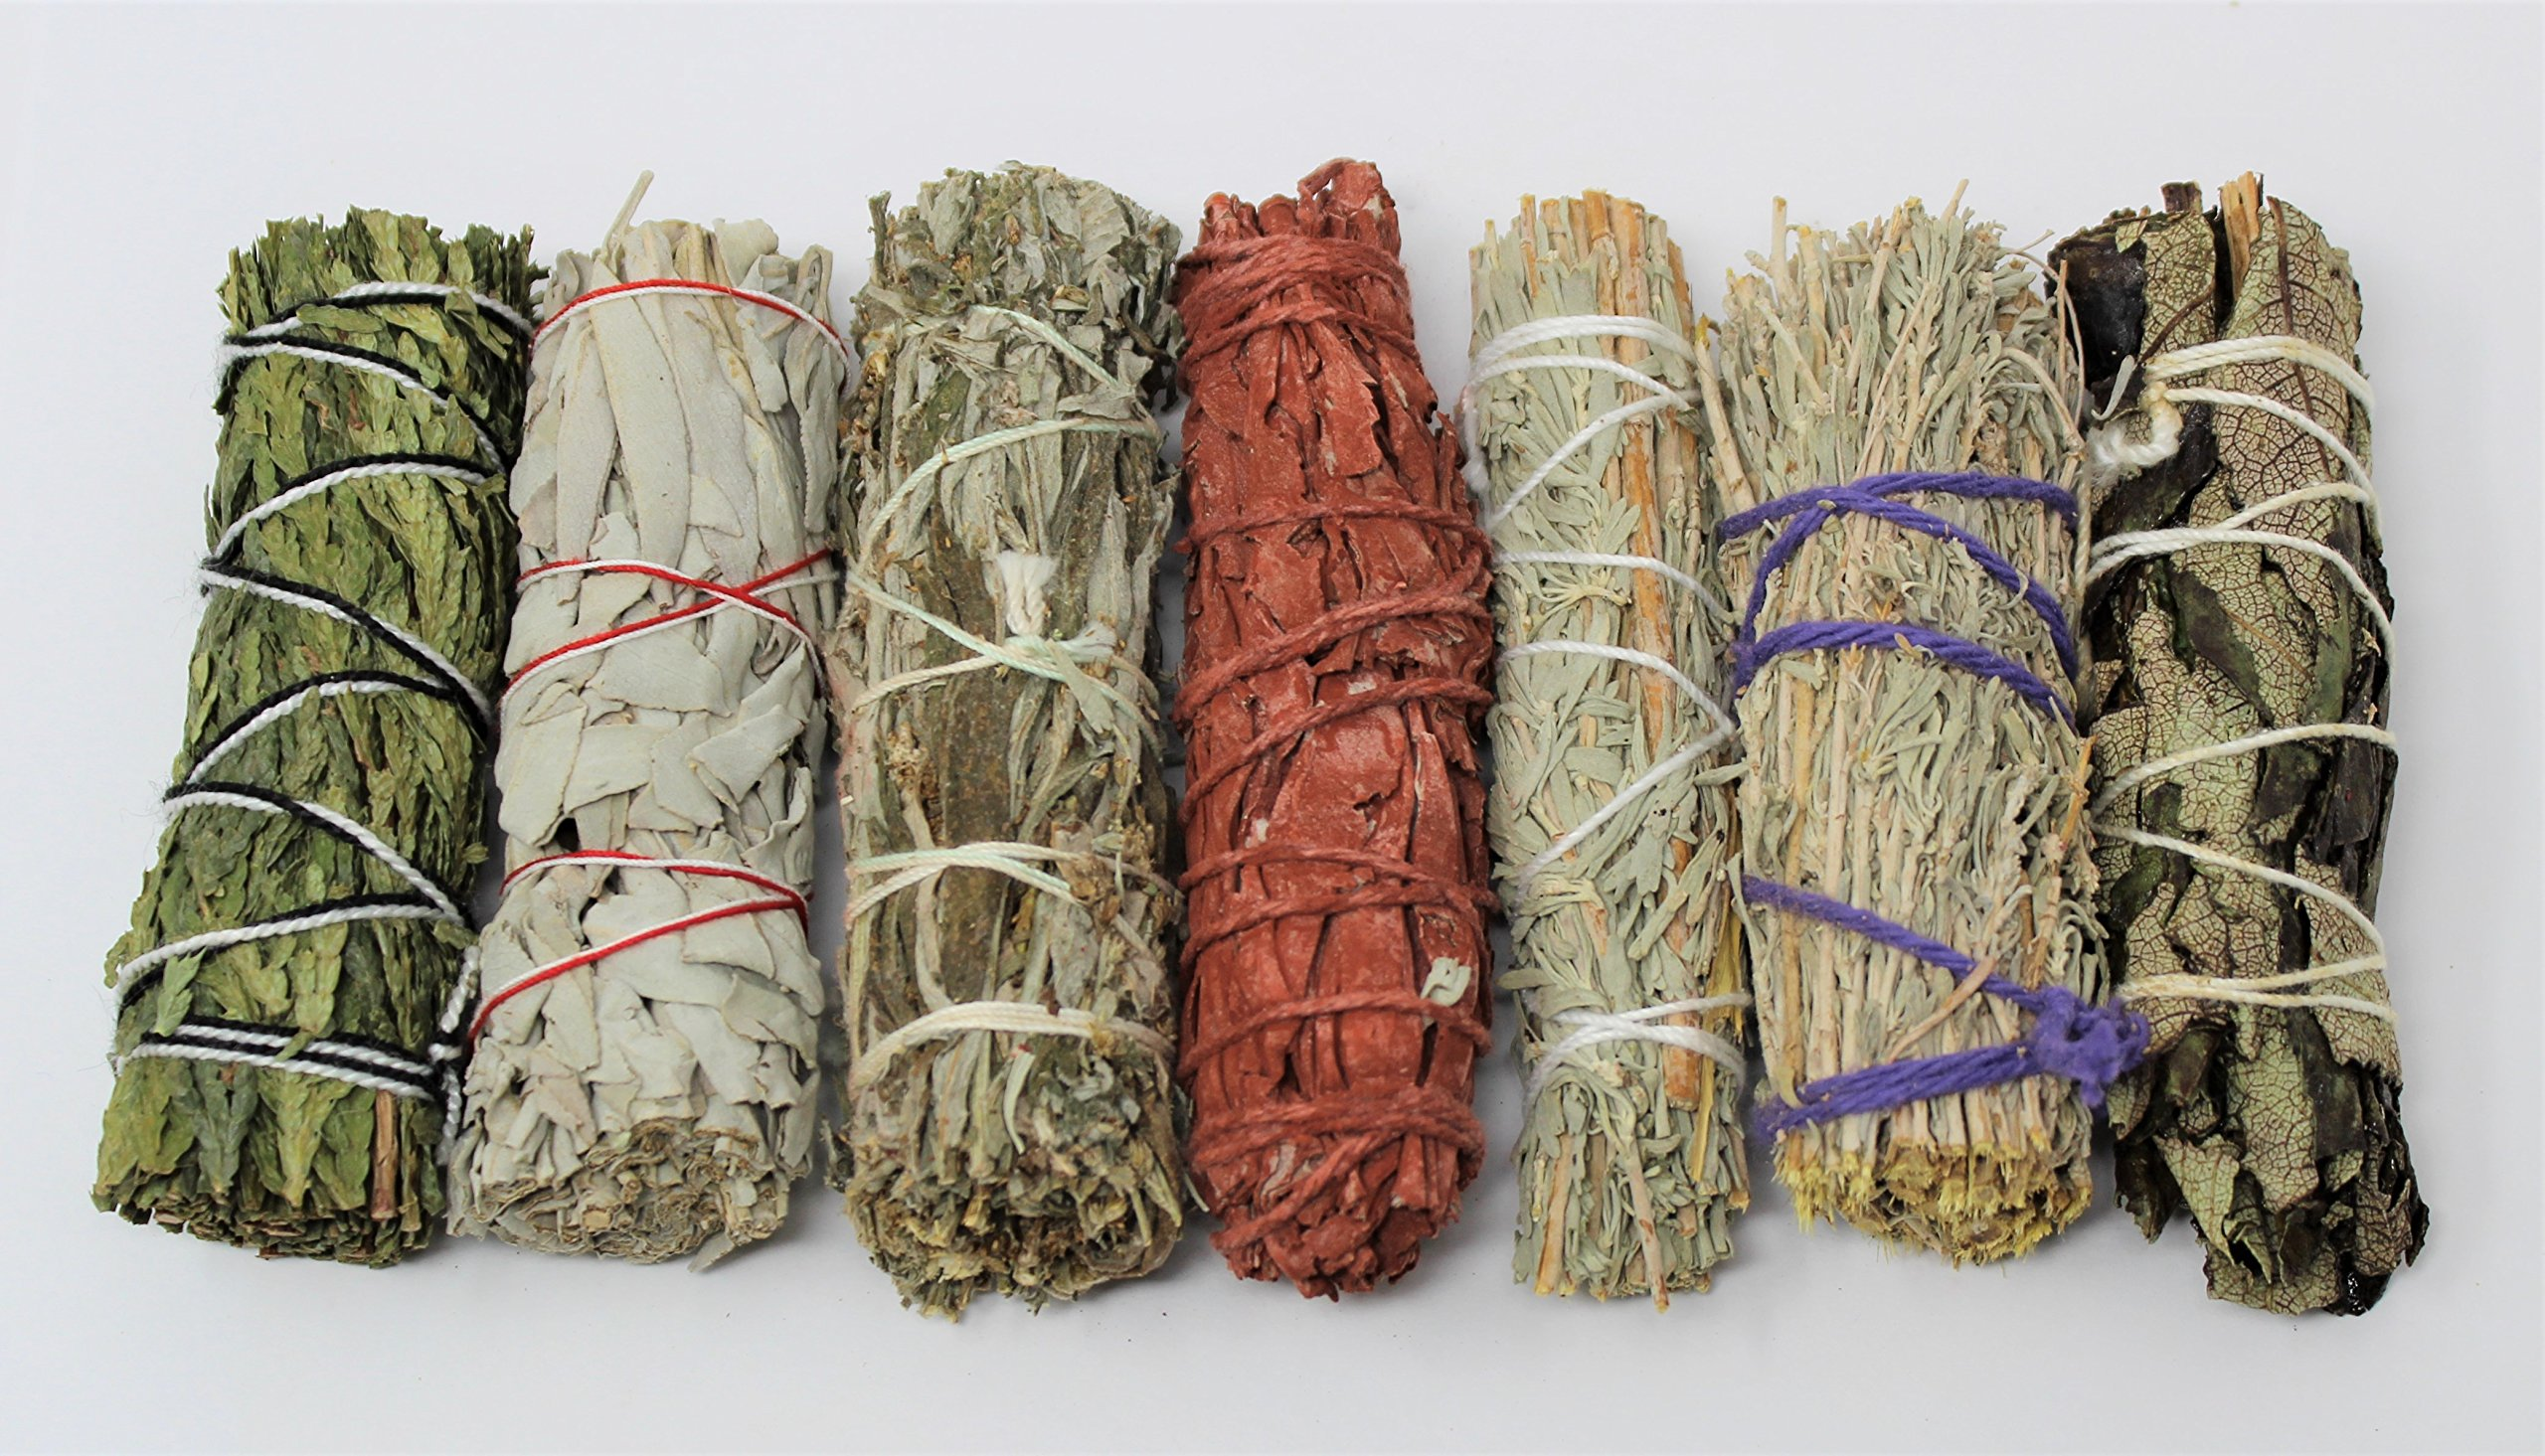 Rainbowrecords239 Set of 7 Sage Smudge Stick SAMPLER: White Black Blue Cedar Dragons Blood Desert Yerba Santa by Rainbowrecords239 (Image #1)